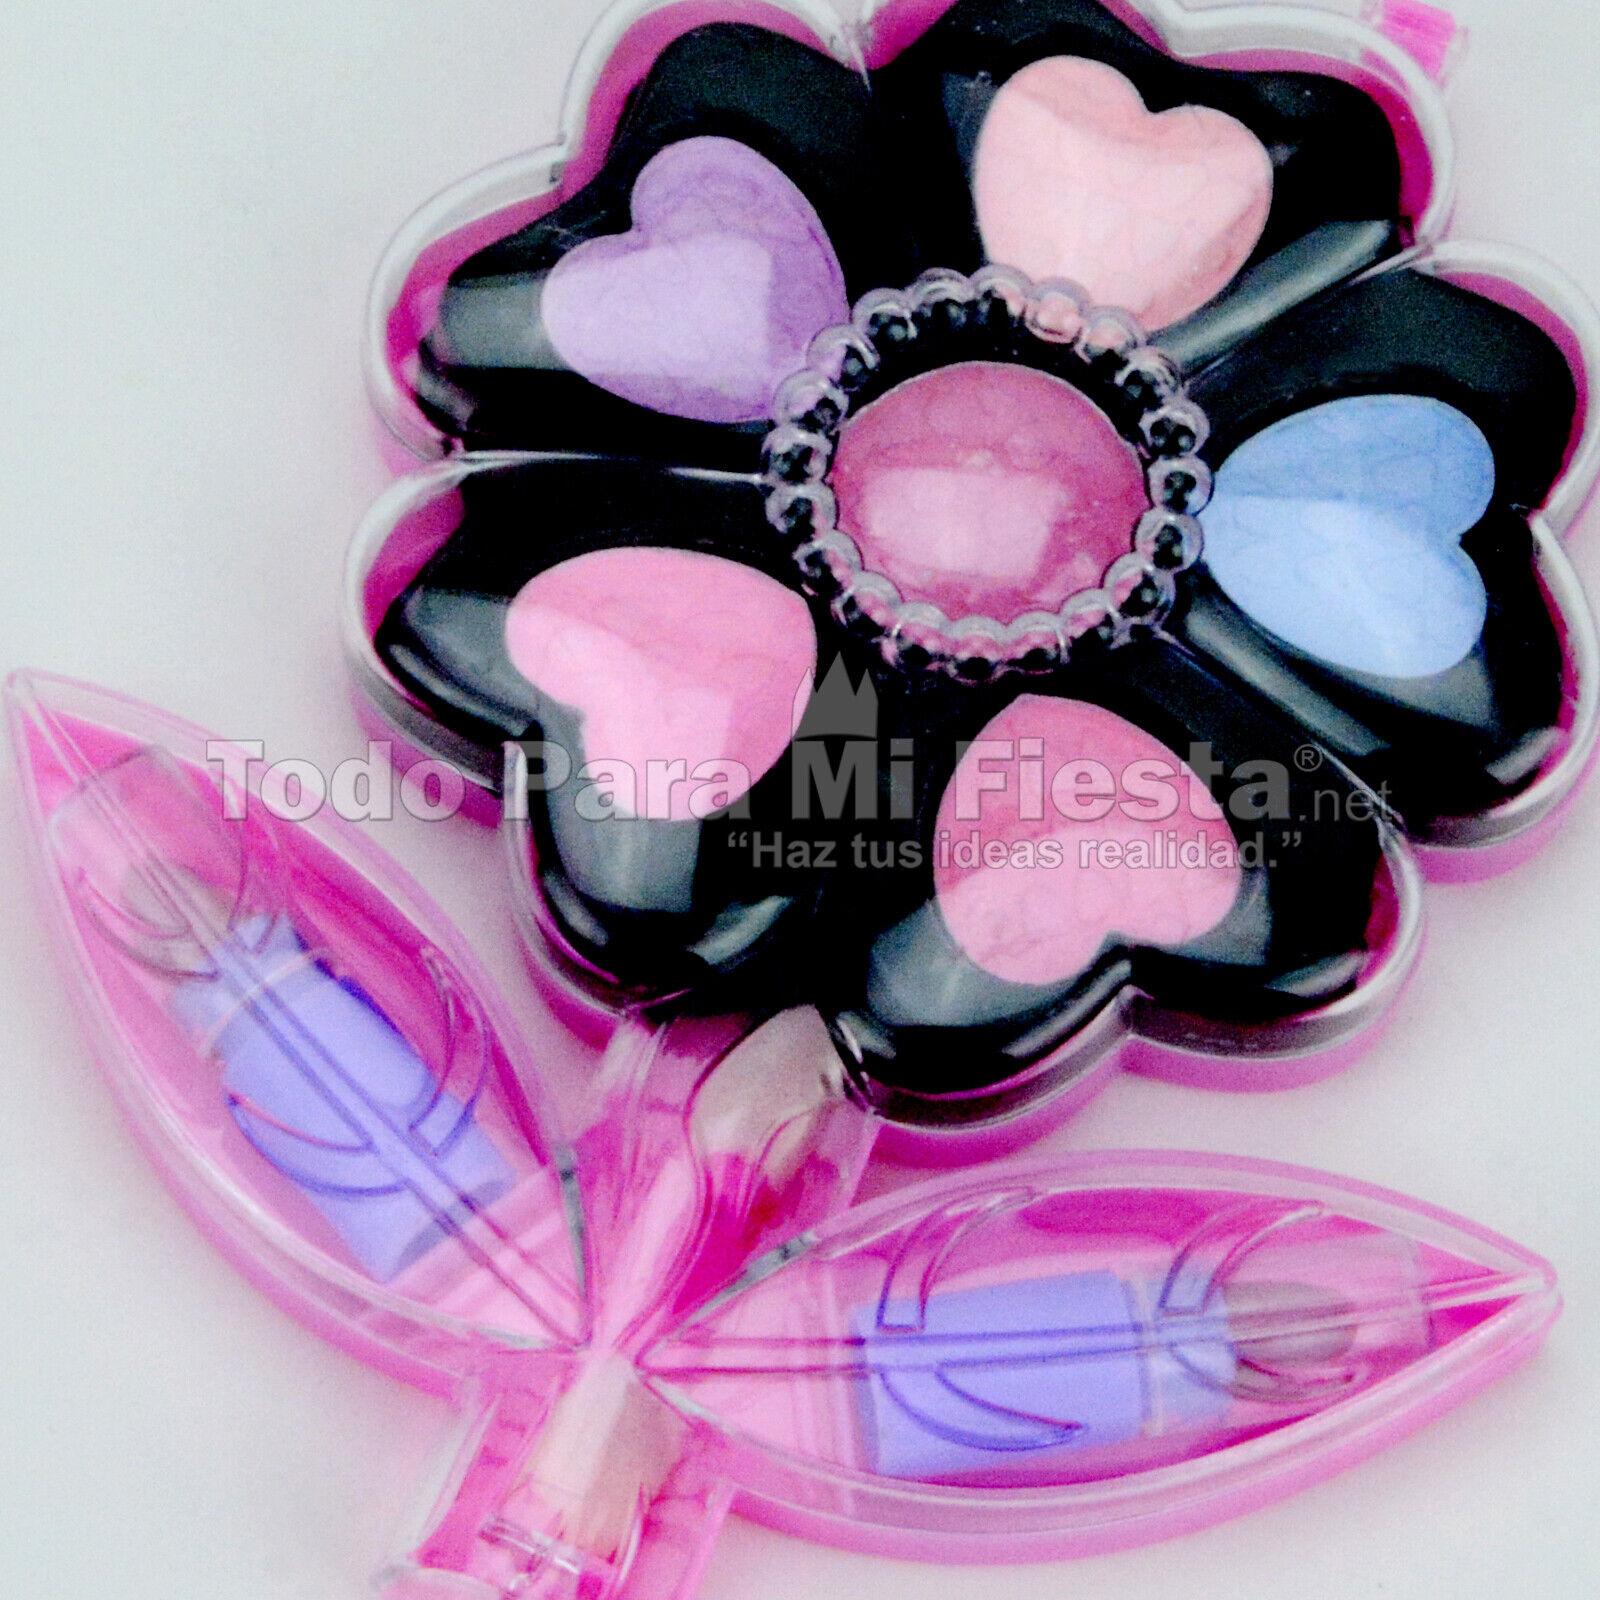 Little Girls Makeup Kit Set Eyeshadows Lipgloss Blush Applic